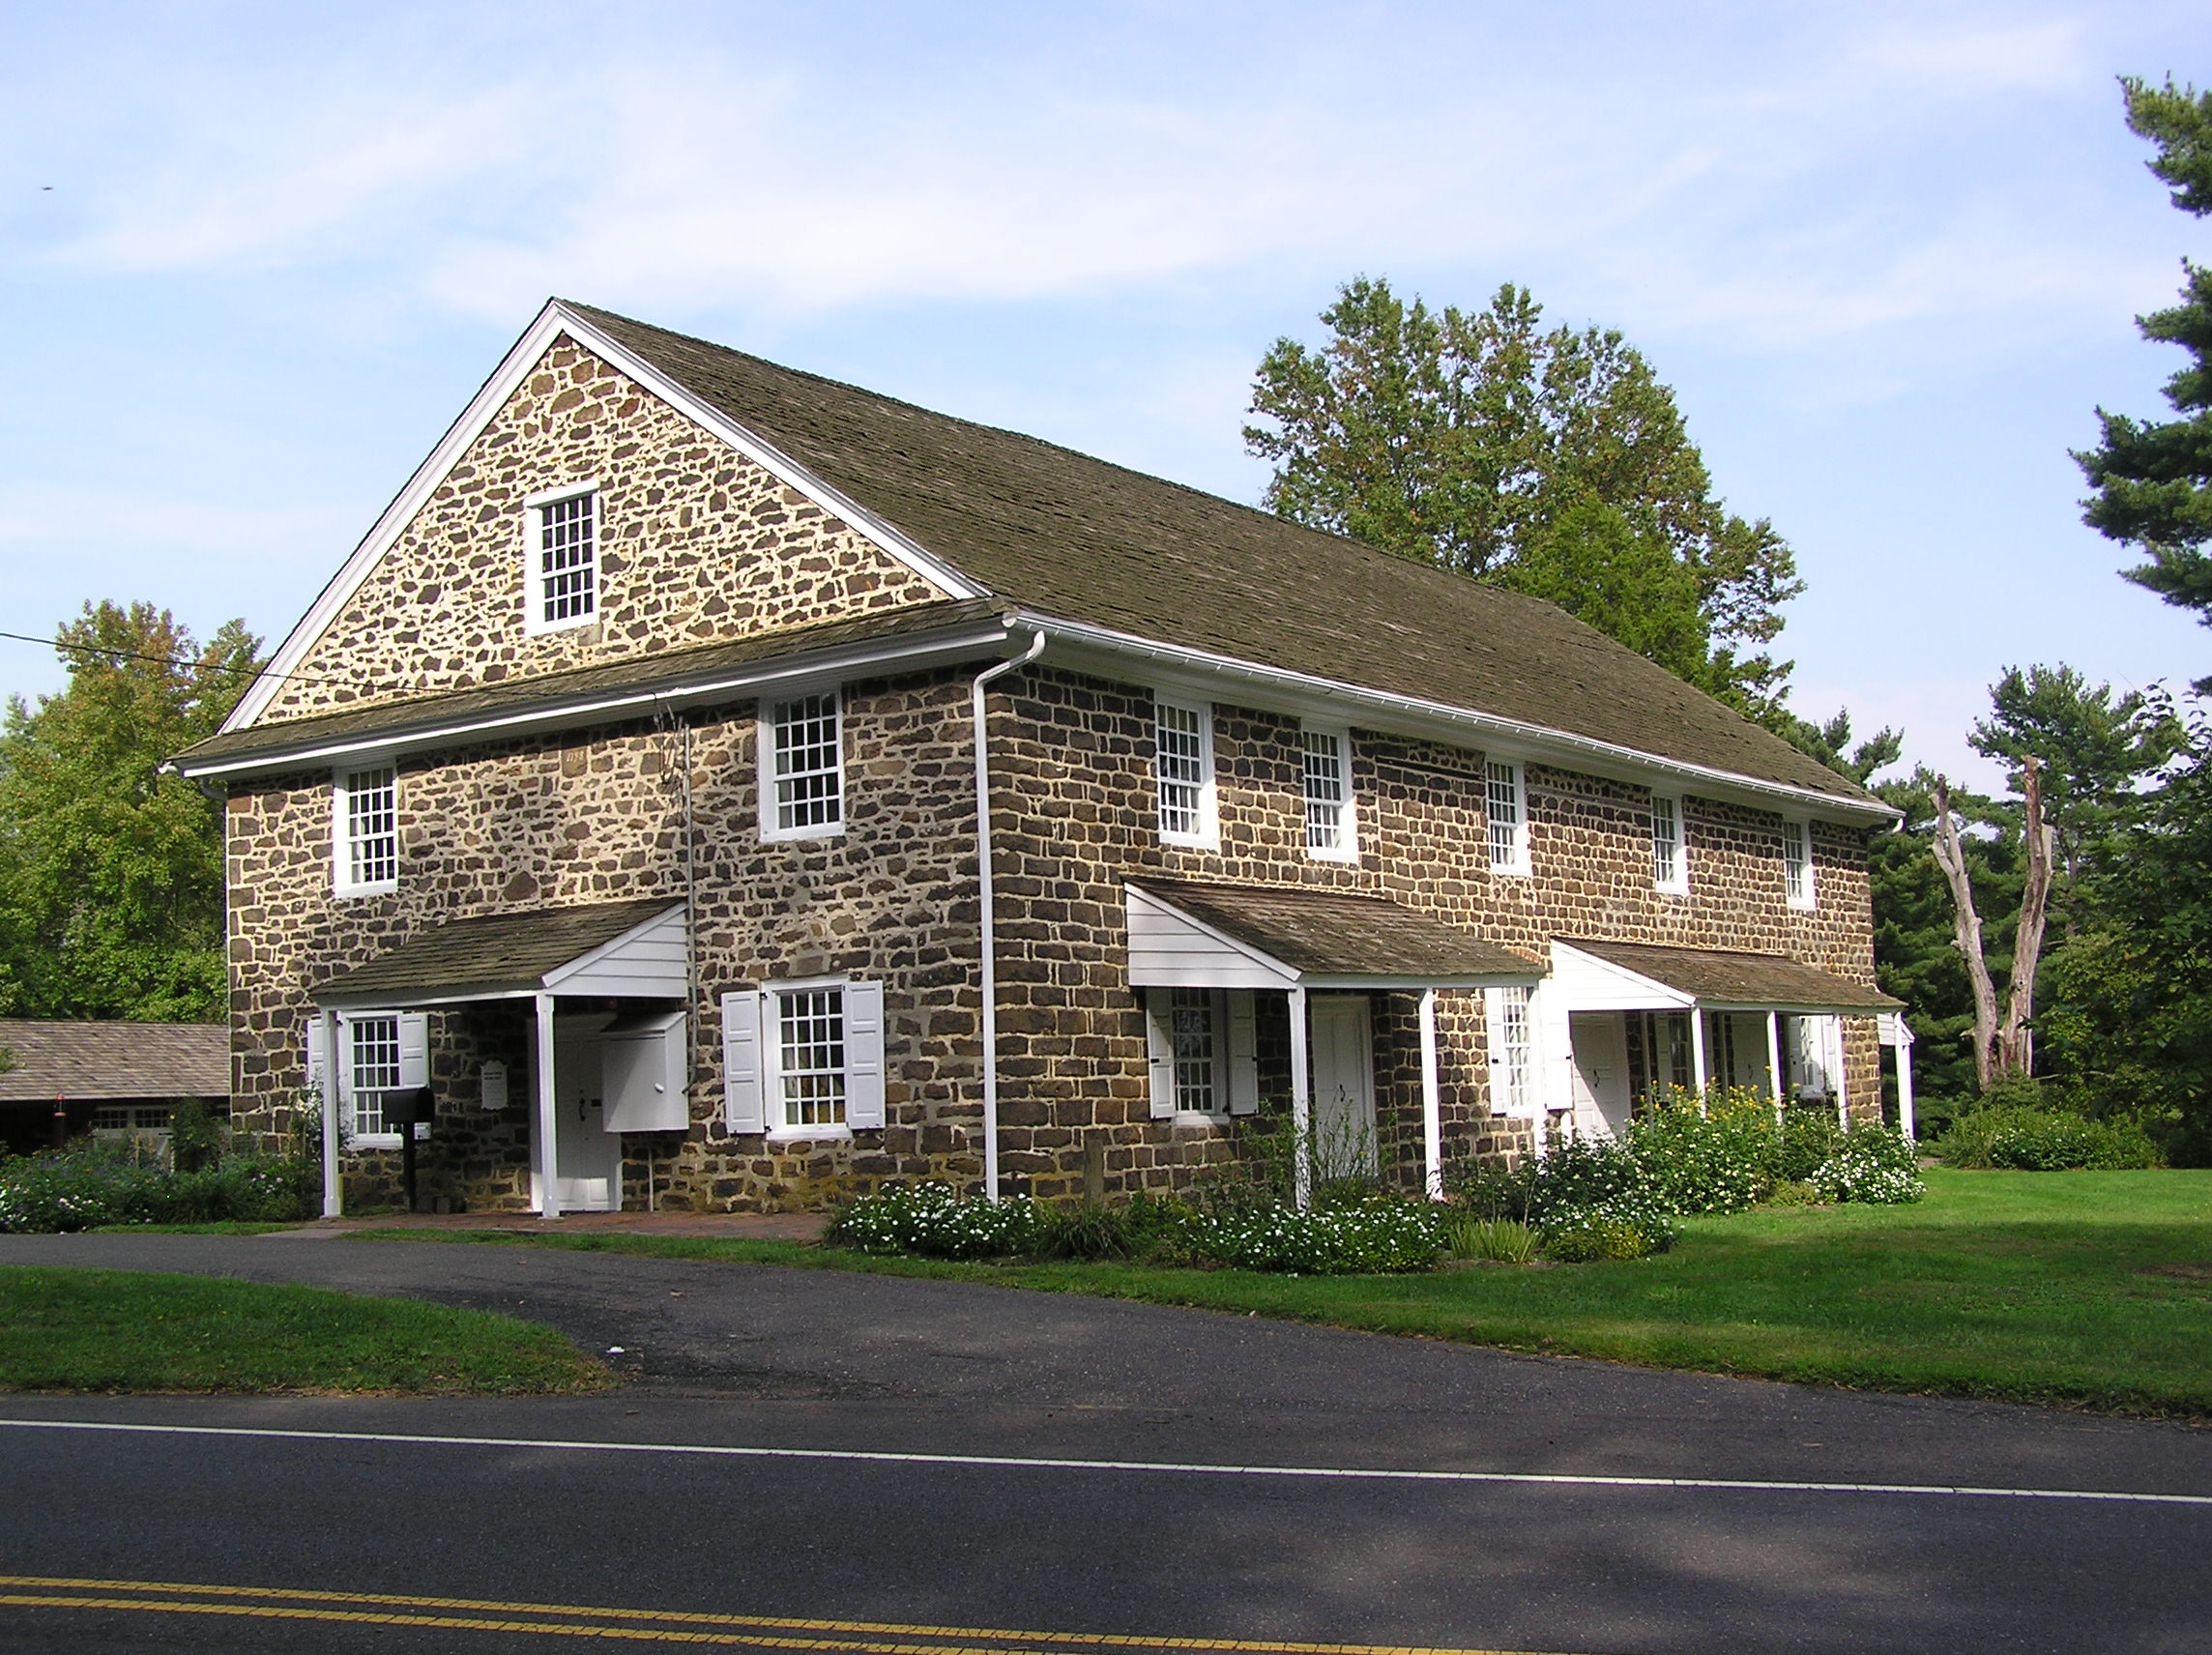 Fine Mount Laurel New Jersey Wikipedia Home Interior And Landscaping Oversignezvosmurscom